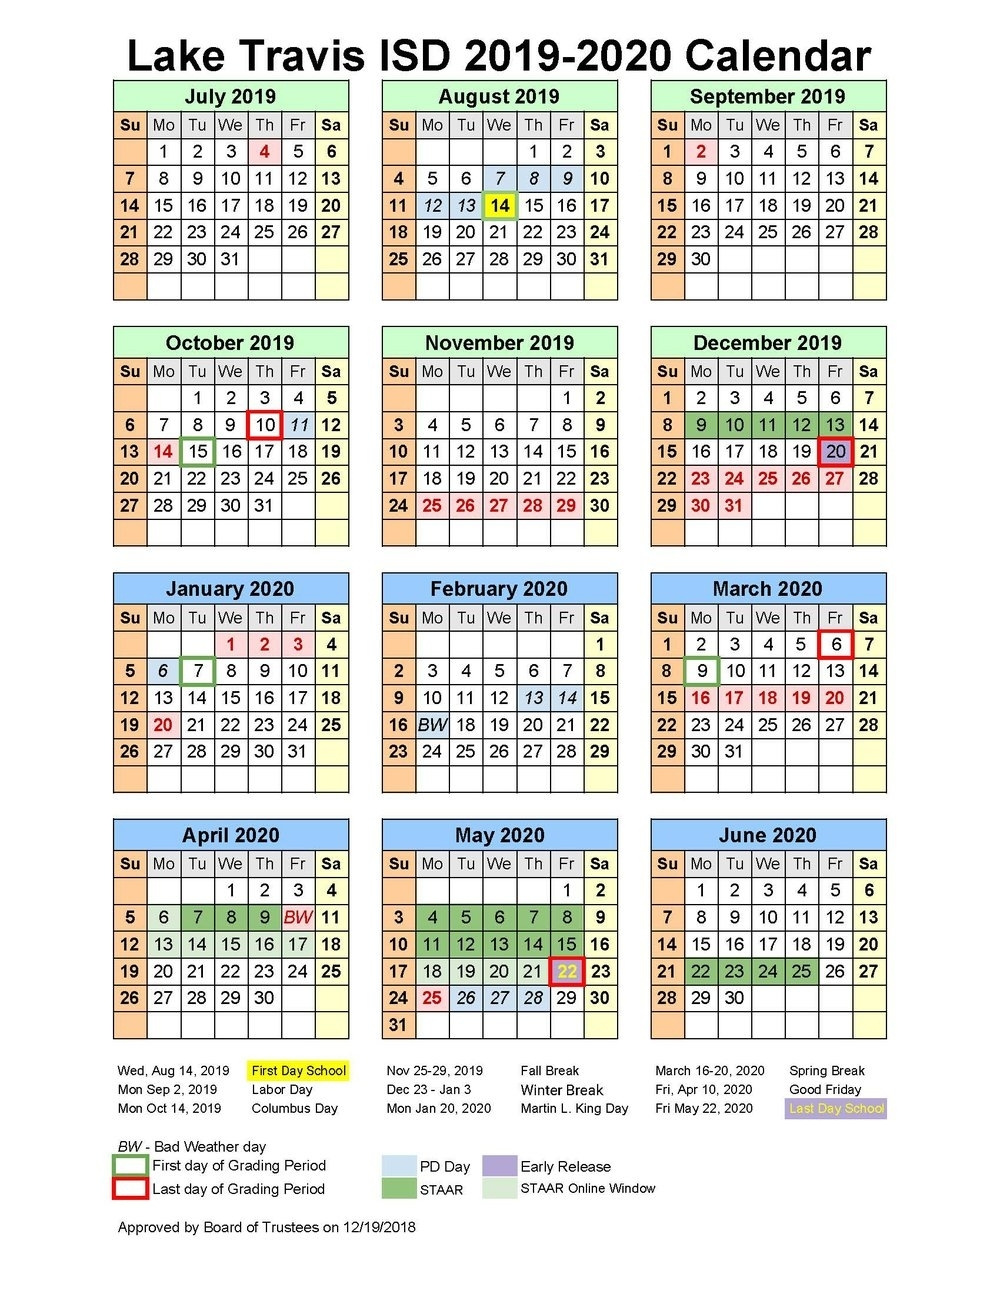 School Matters regarding Stephen F Austin Calendar 2019 - 2020